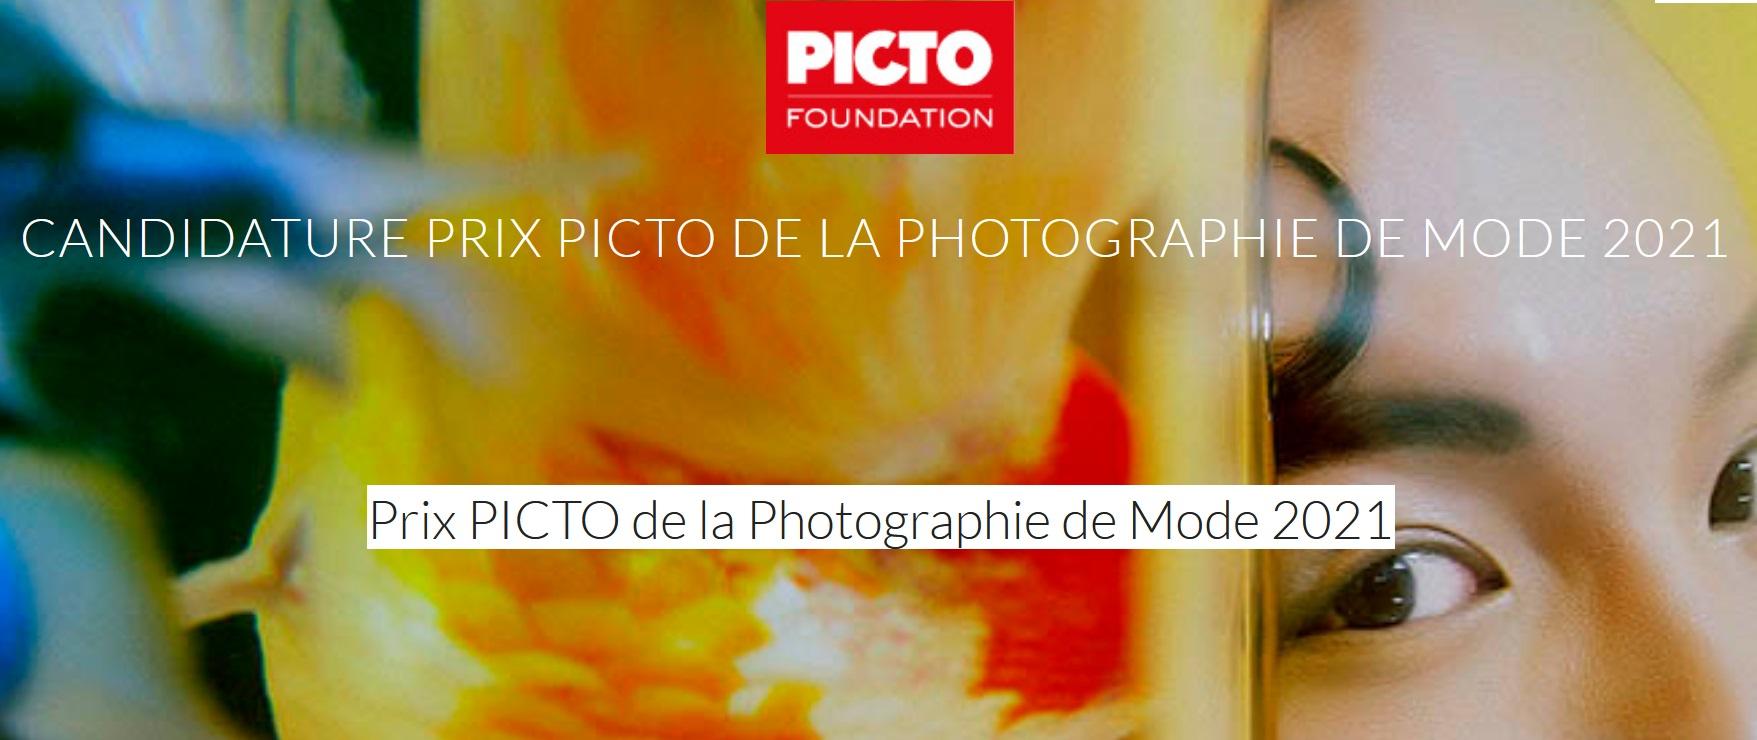 Prix Picto de la Mode 2021 - logo